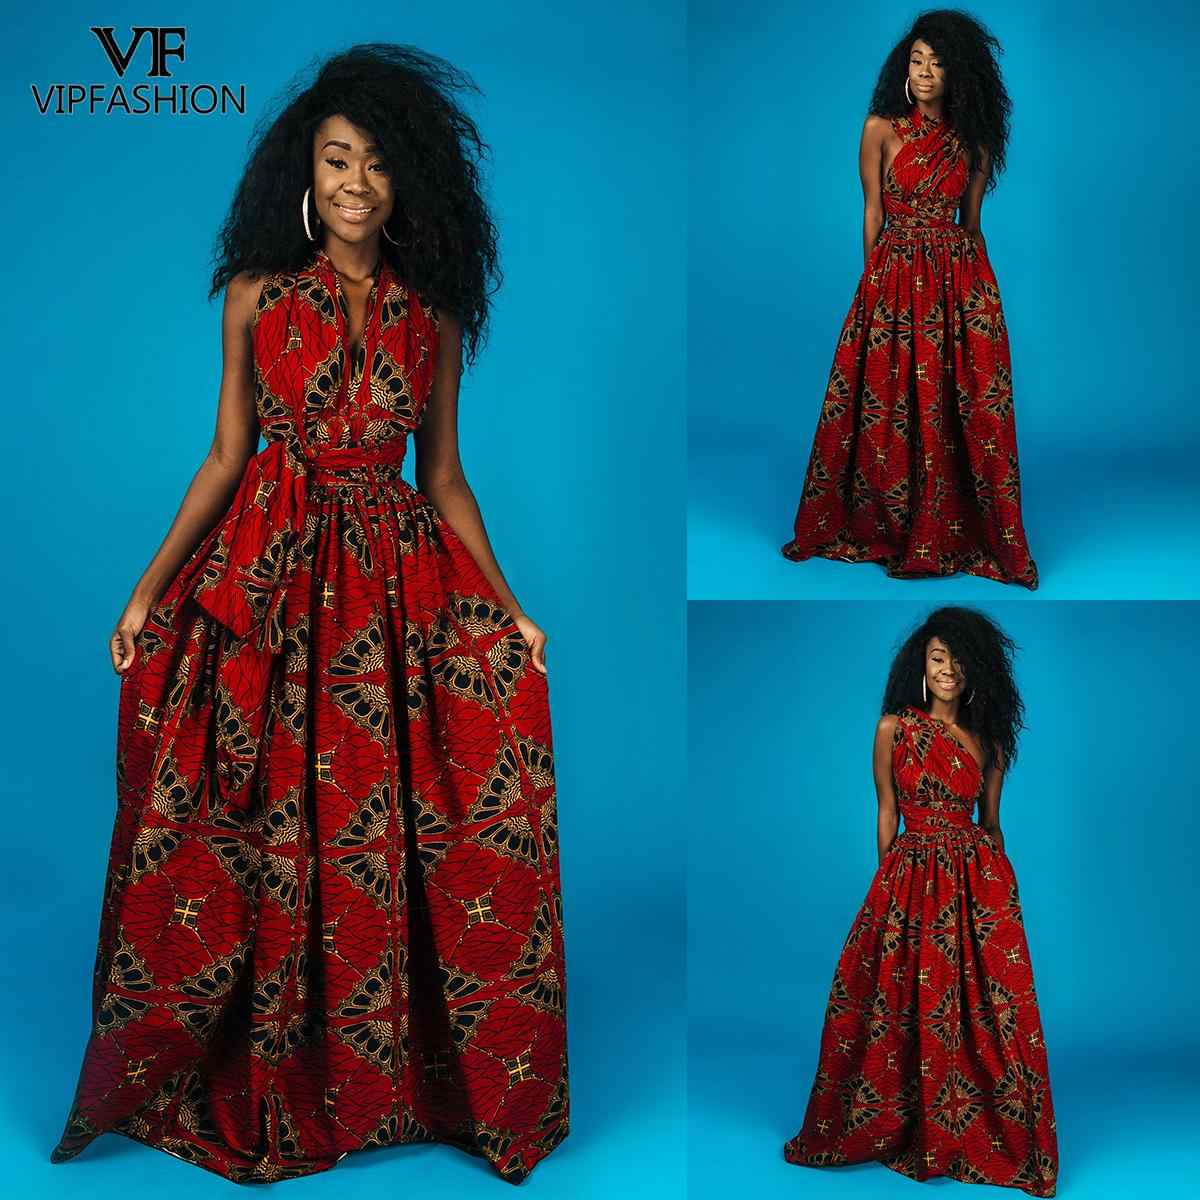 VIP mode mode été Tribal Nation Style Sexy longue Robe florale africaine impression Robe pour les femmes grande taille indien longue Robe